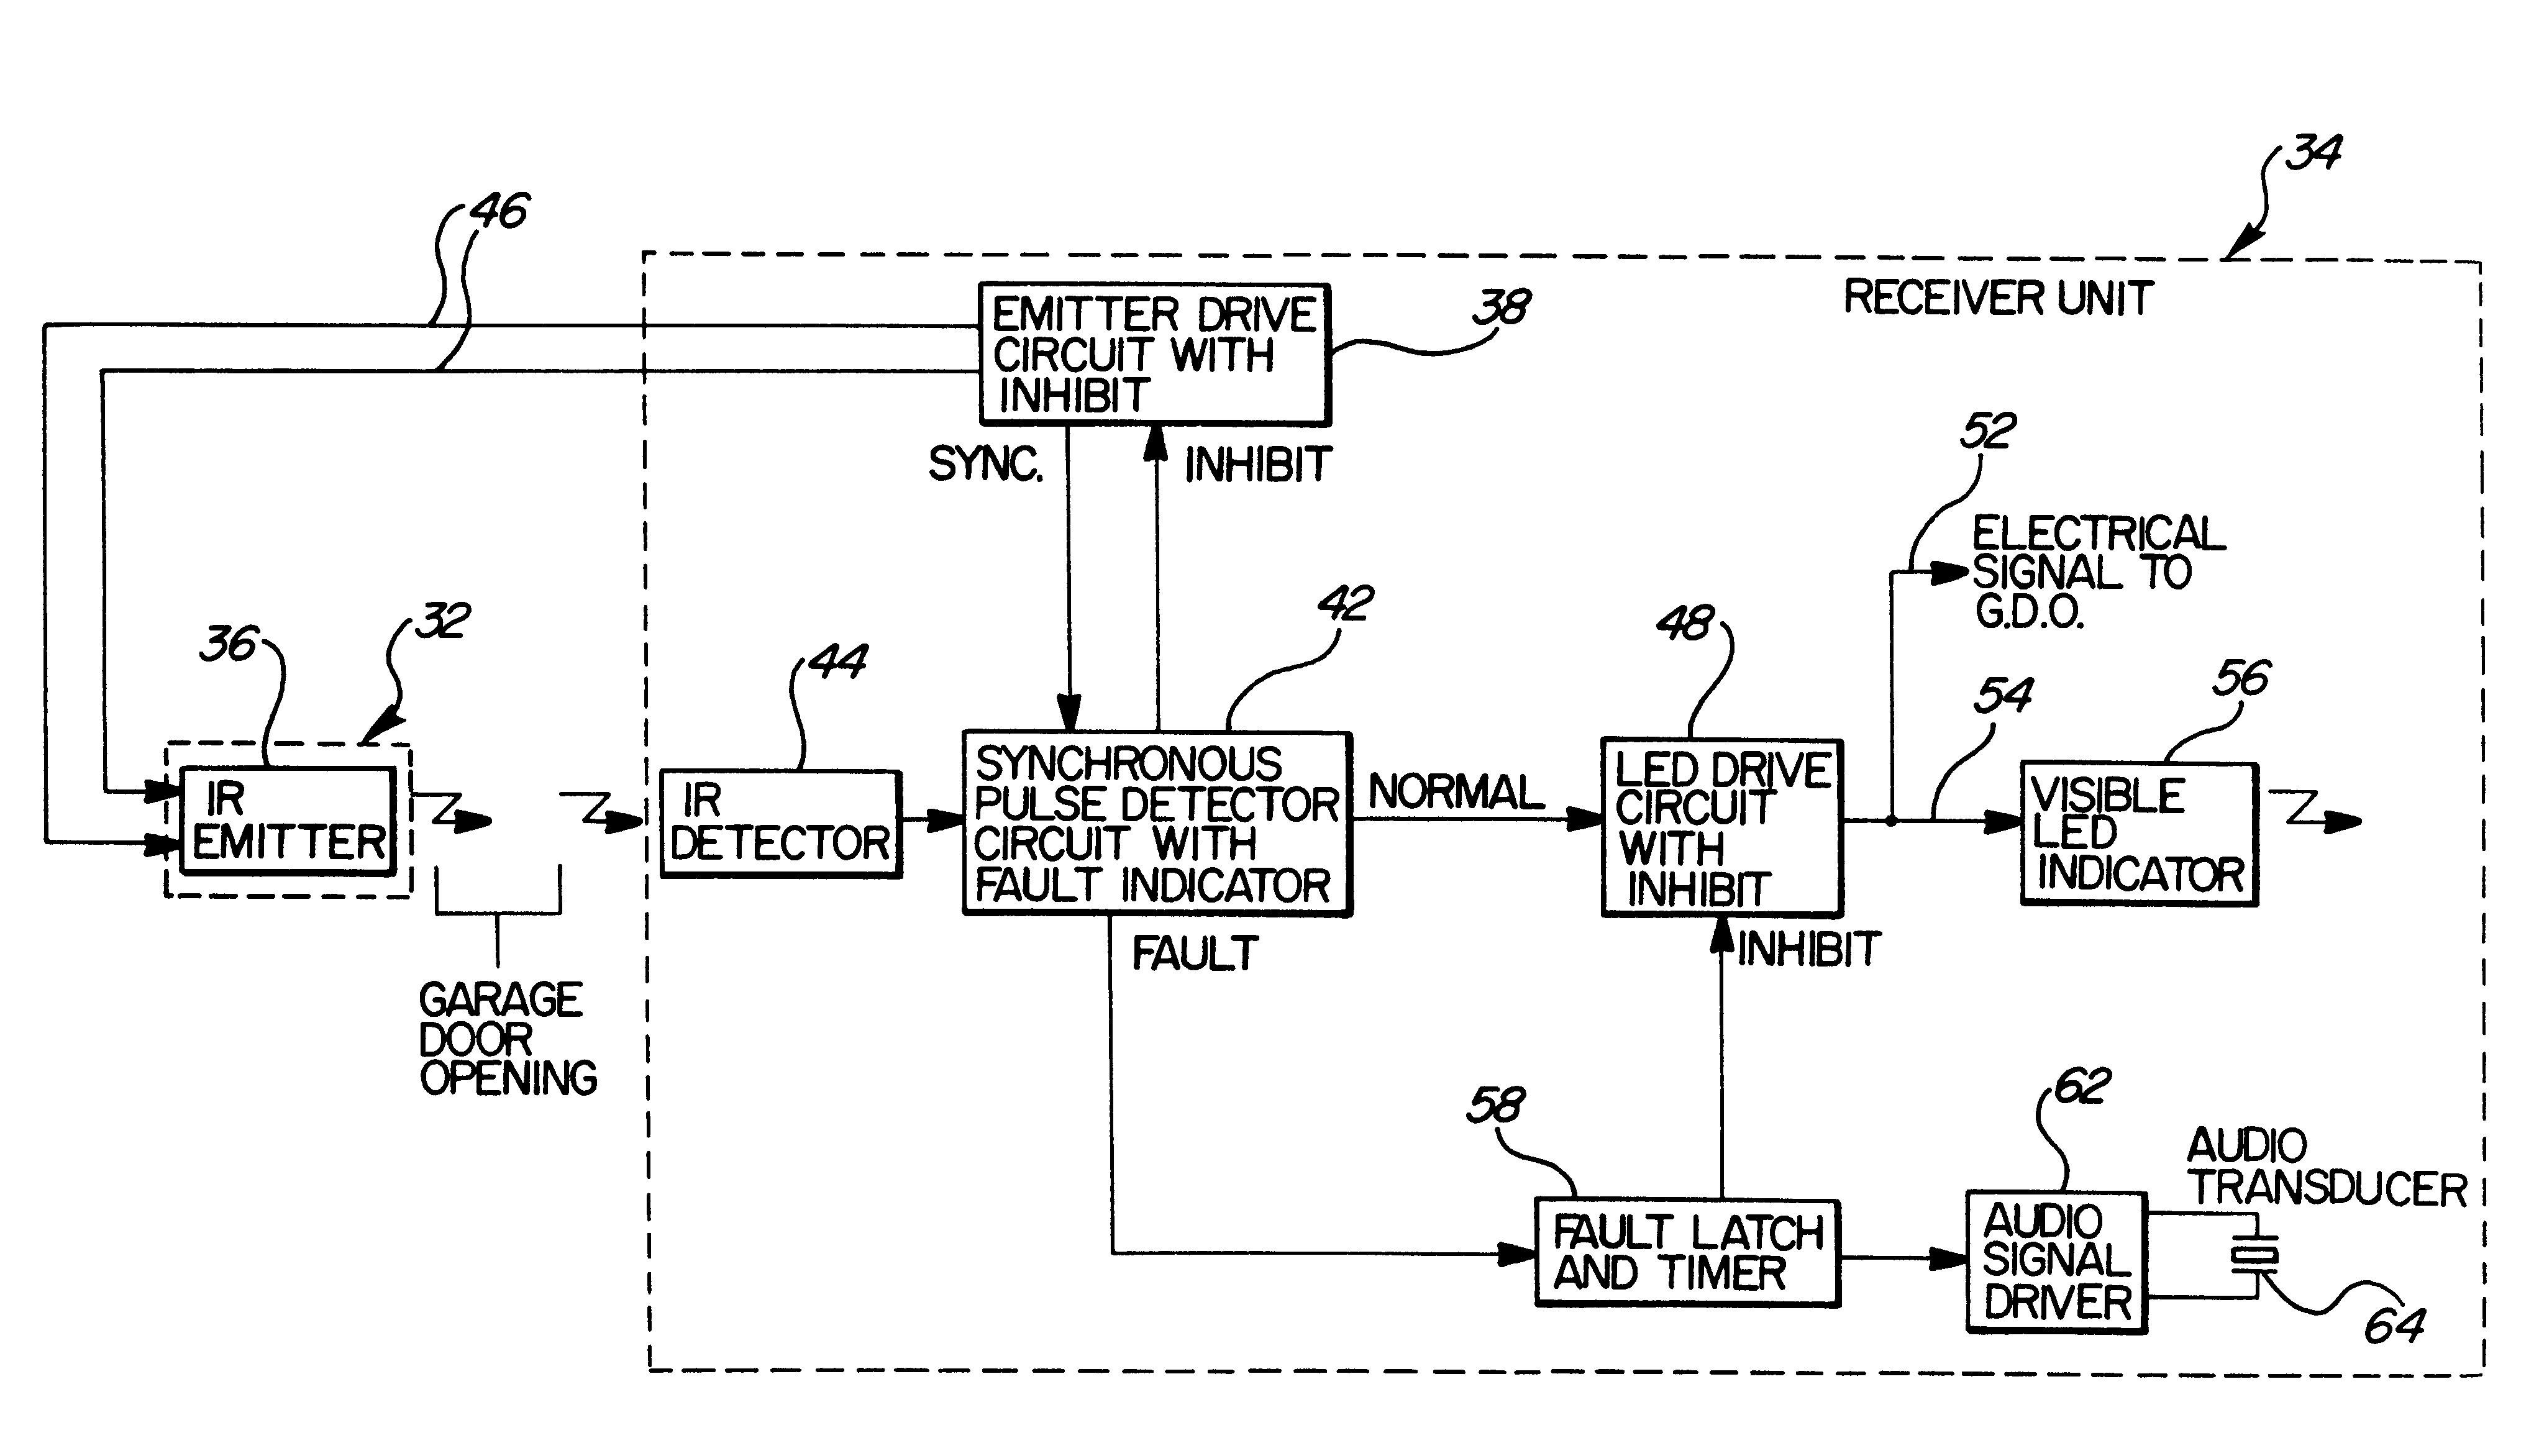 wiring diagram for lift master safety sensors wiring diagrams Garage Door Opener Schematic Diagram